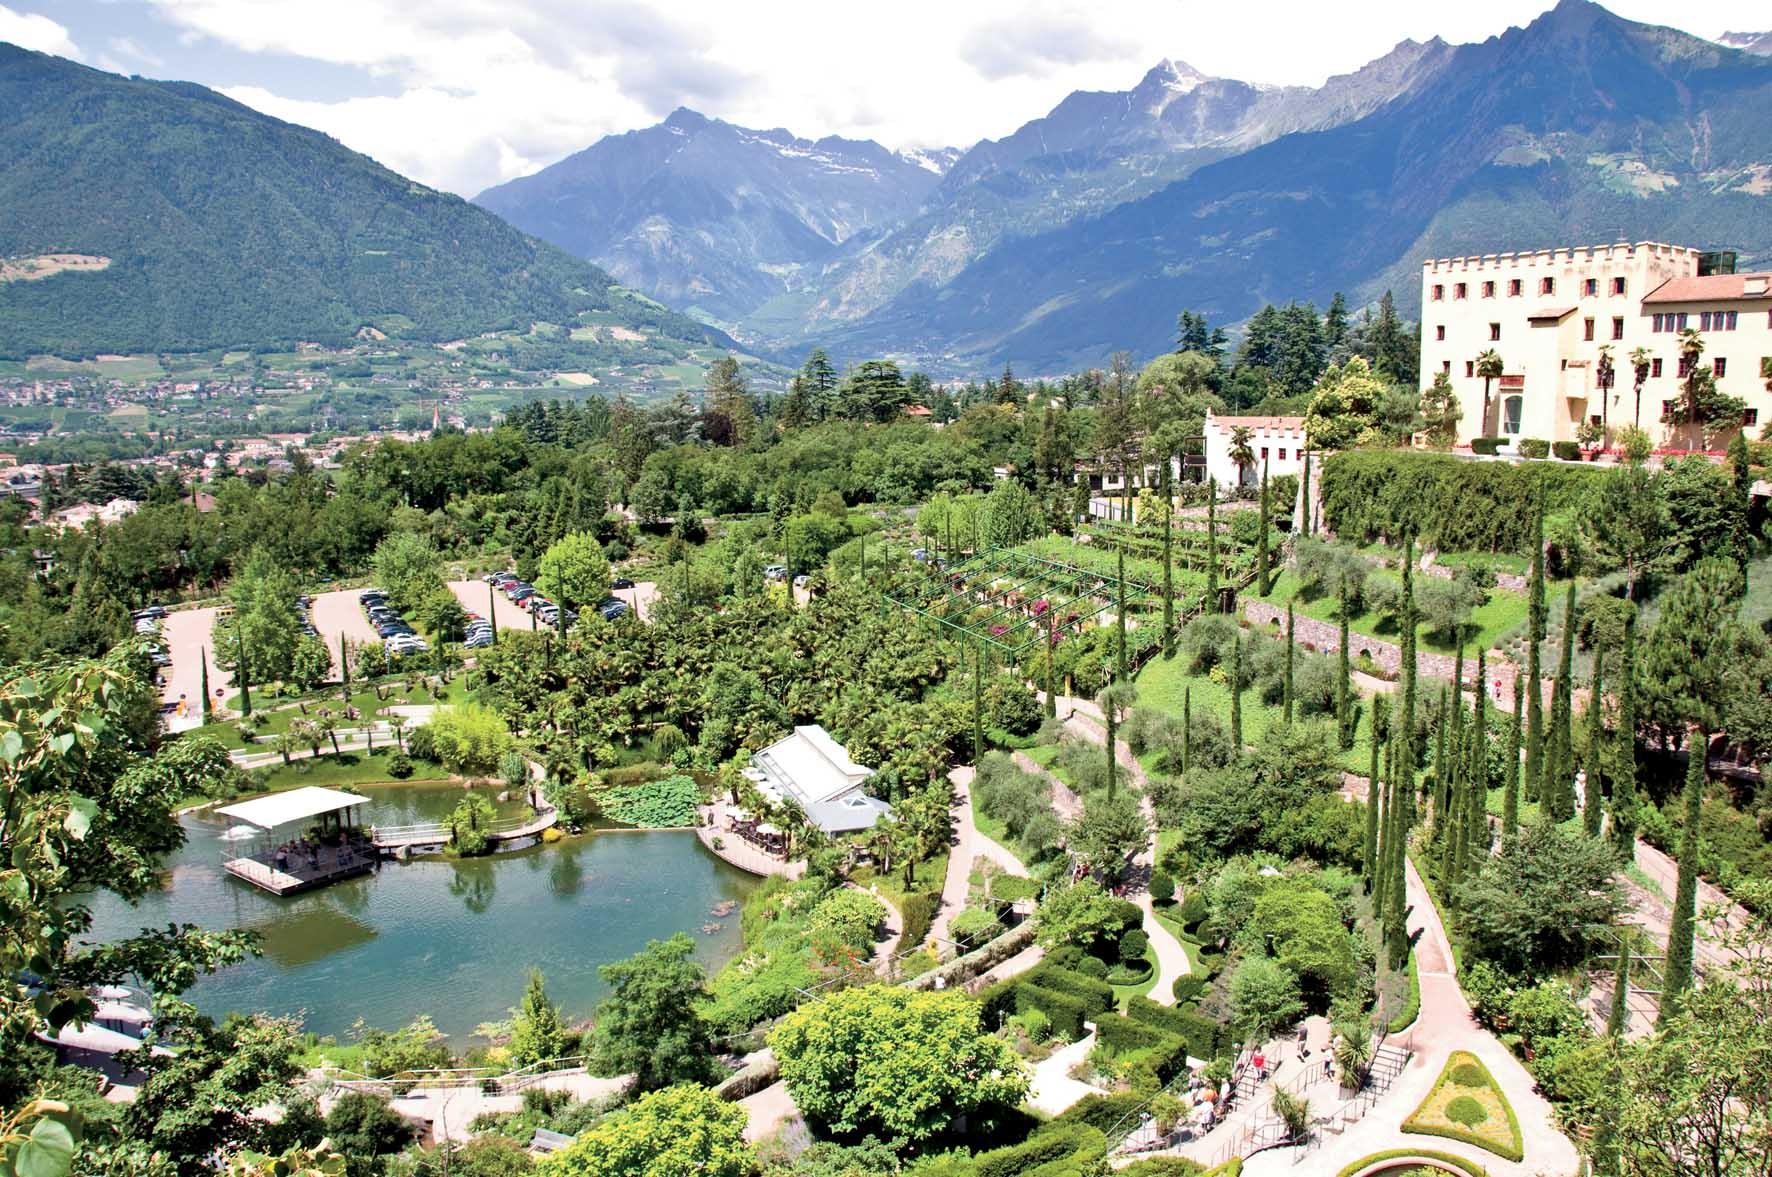 Giardini-Trauttsmandorff-Merano-ilnordest-quotidiano